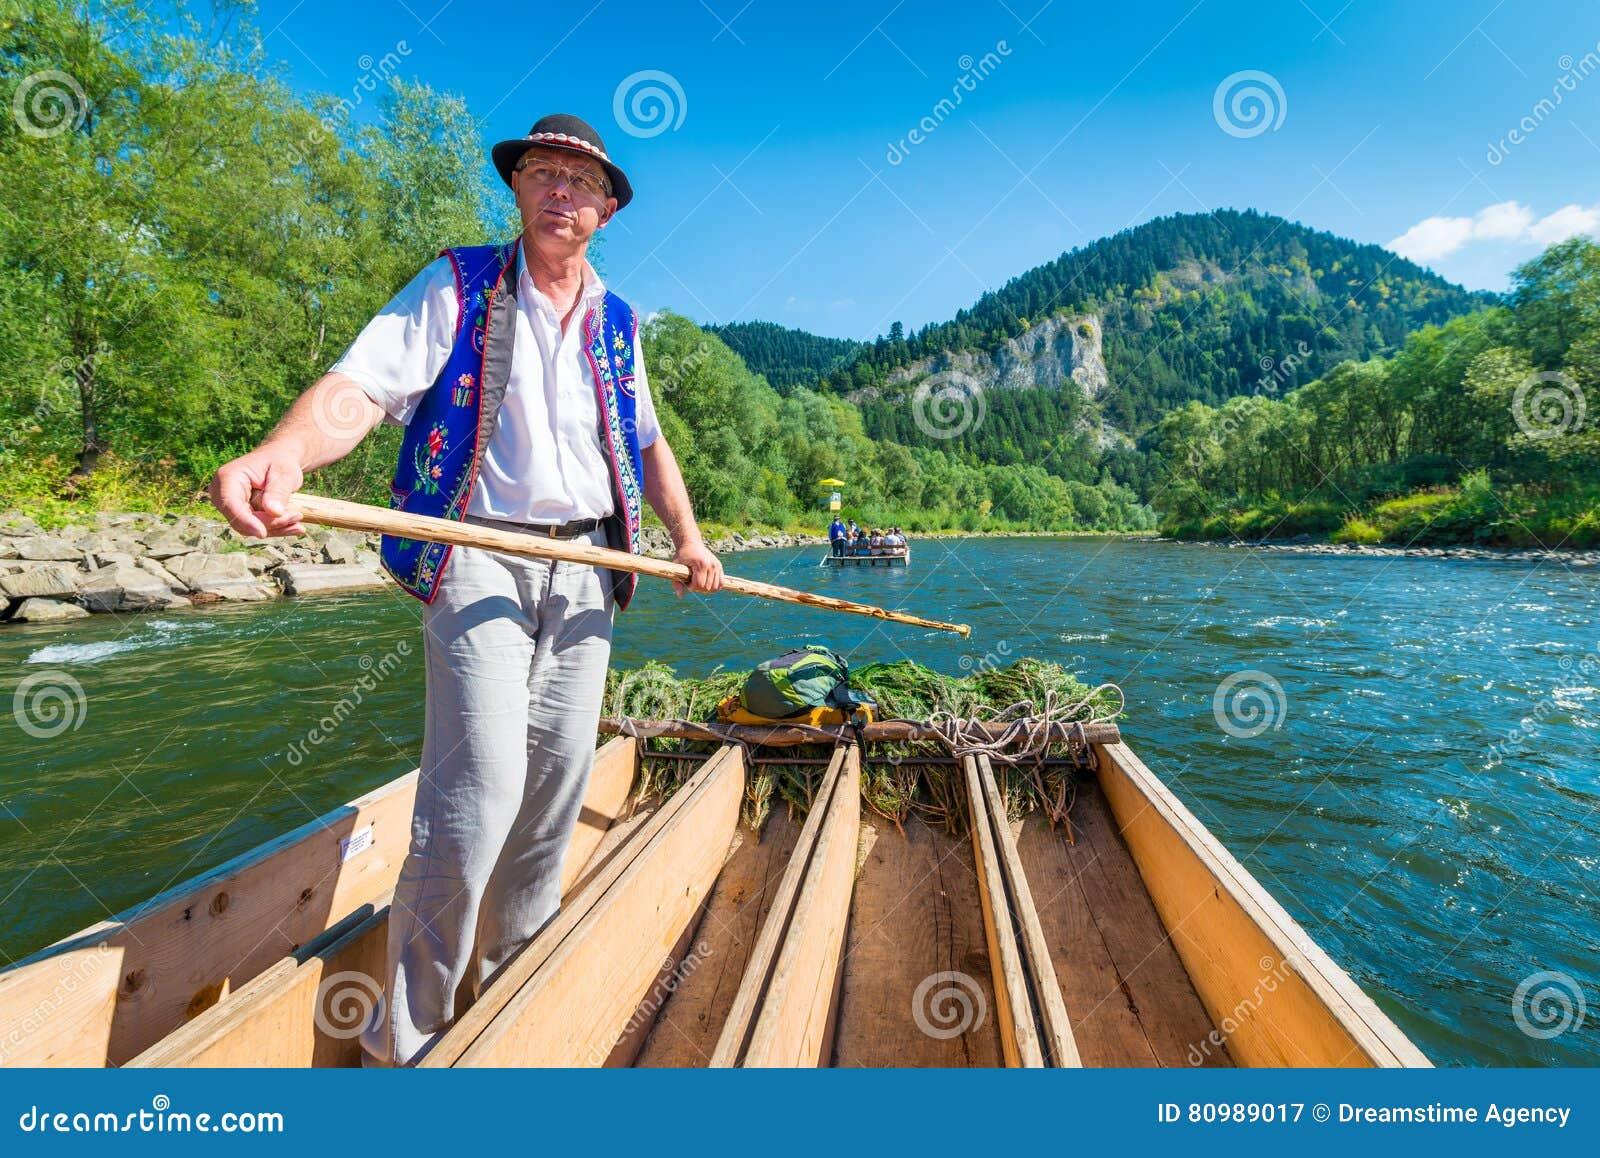 Sromowce Nizne, Poland - August 25, 2015. Dunajec River Gorge